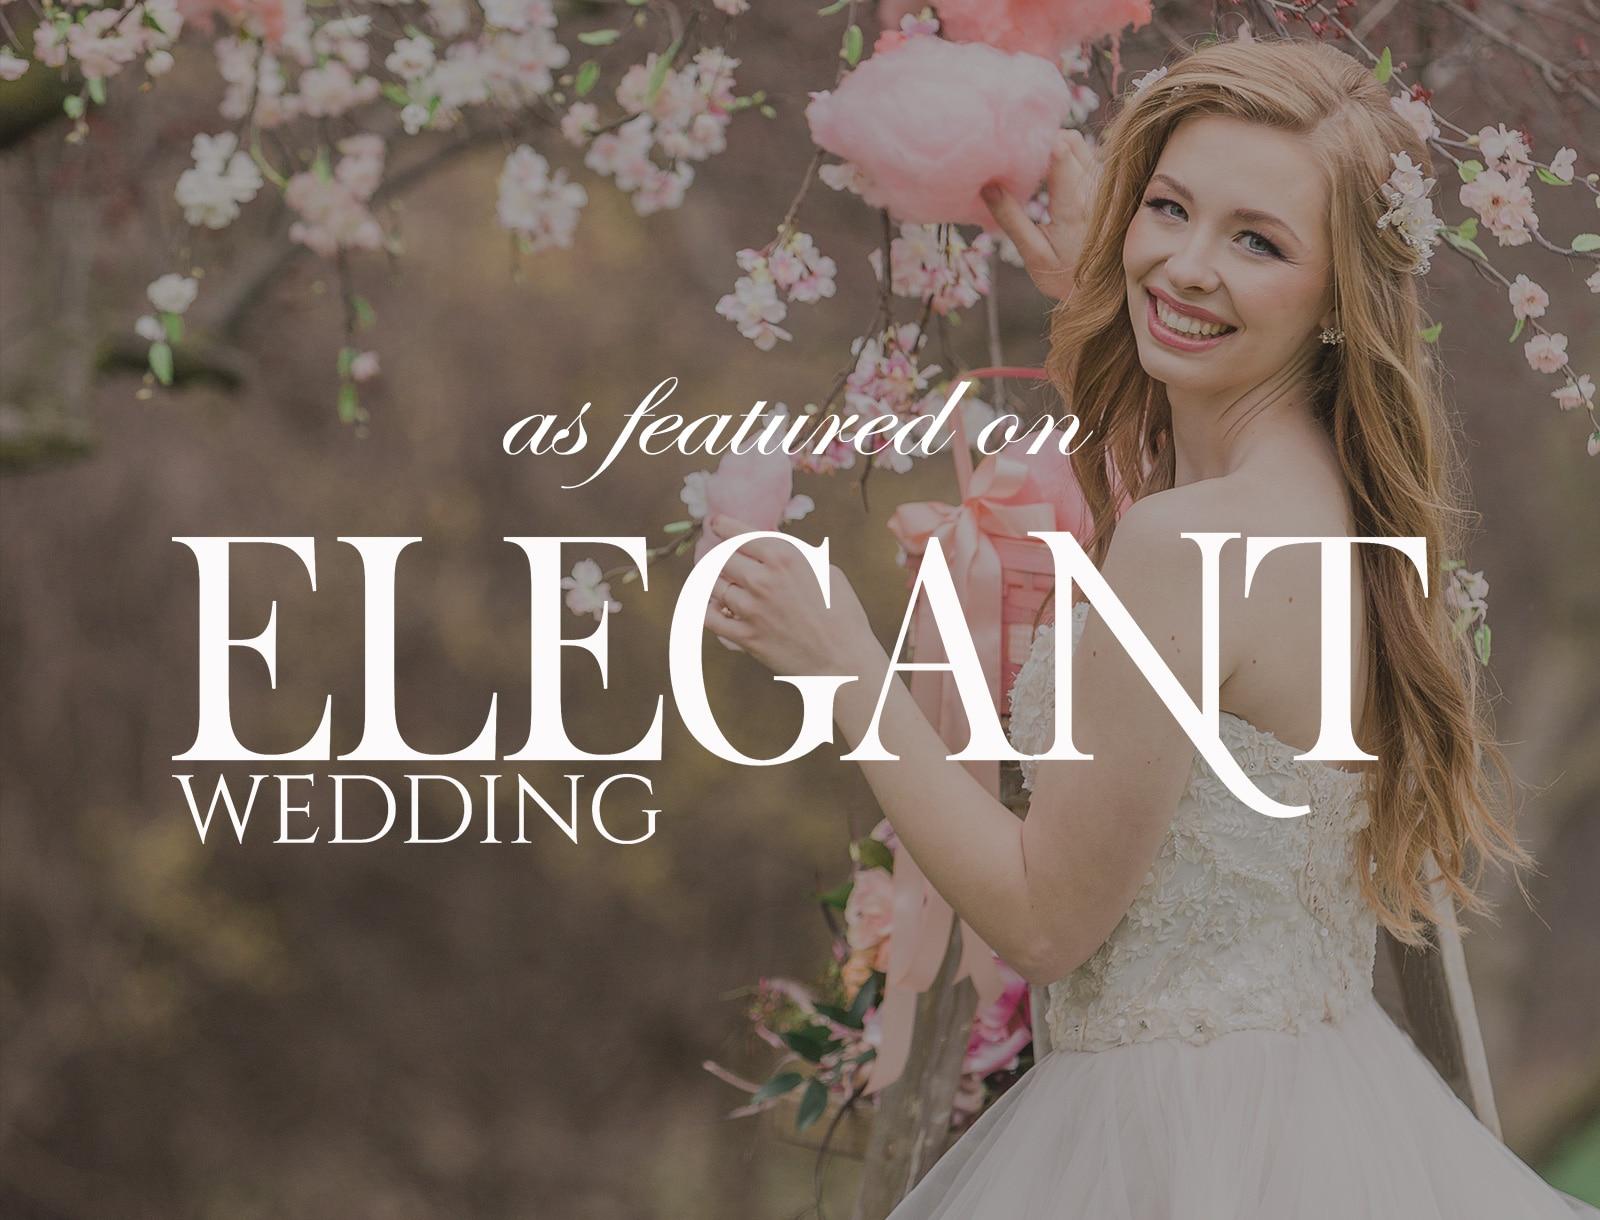 Featured on Elegant Wedding Magazine: Cotton Candy Clouds